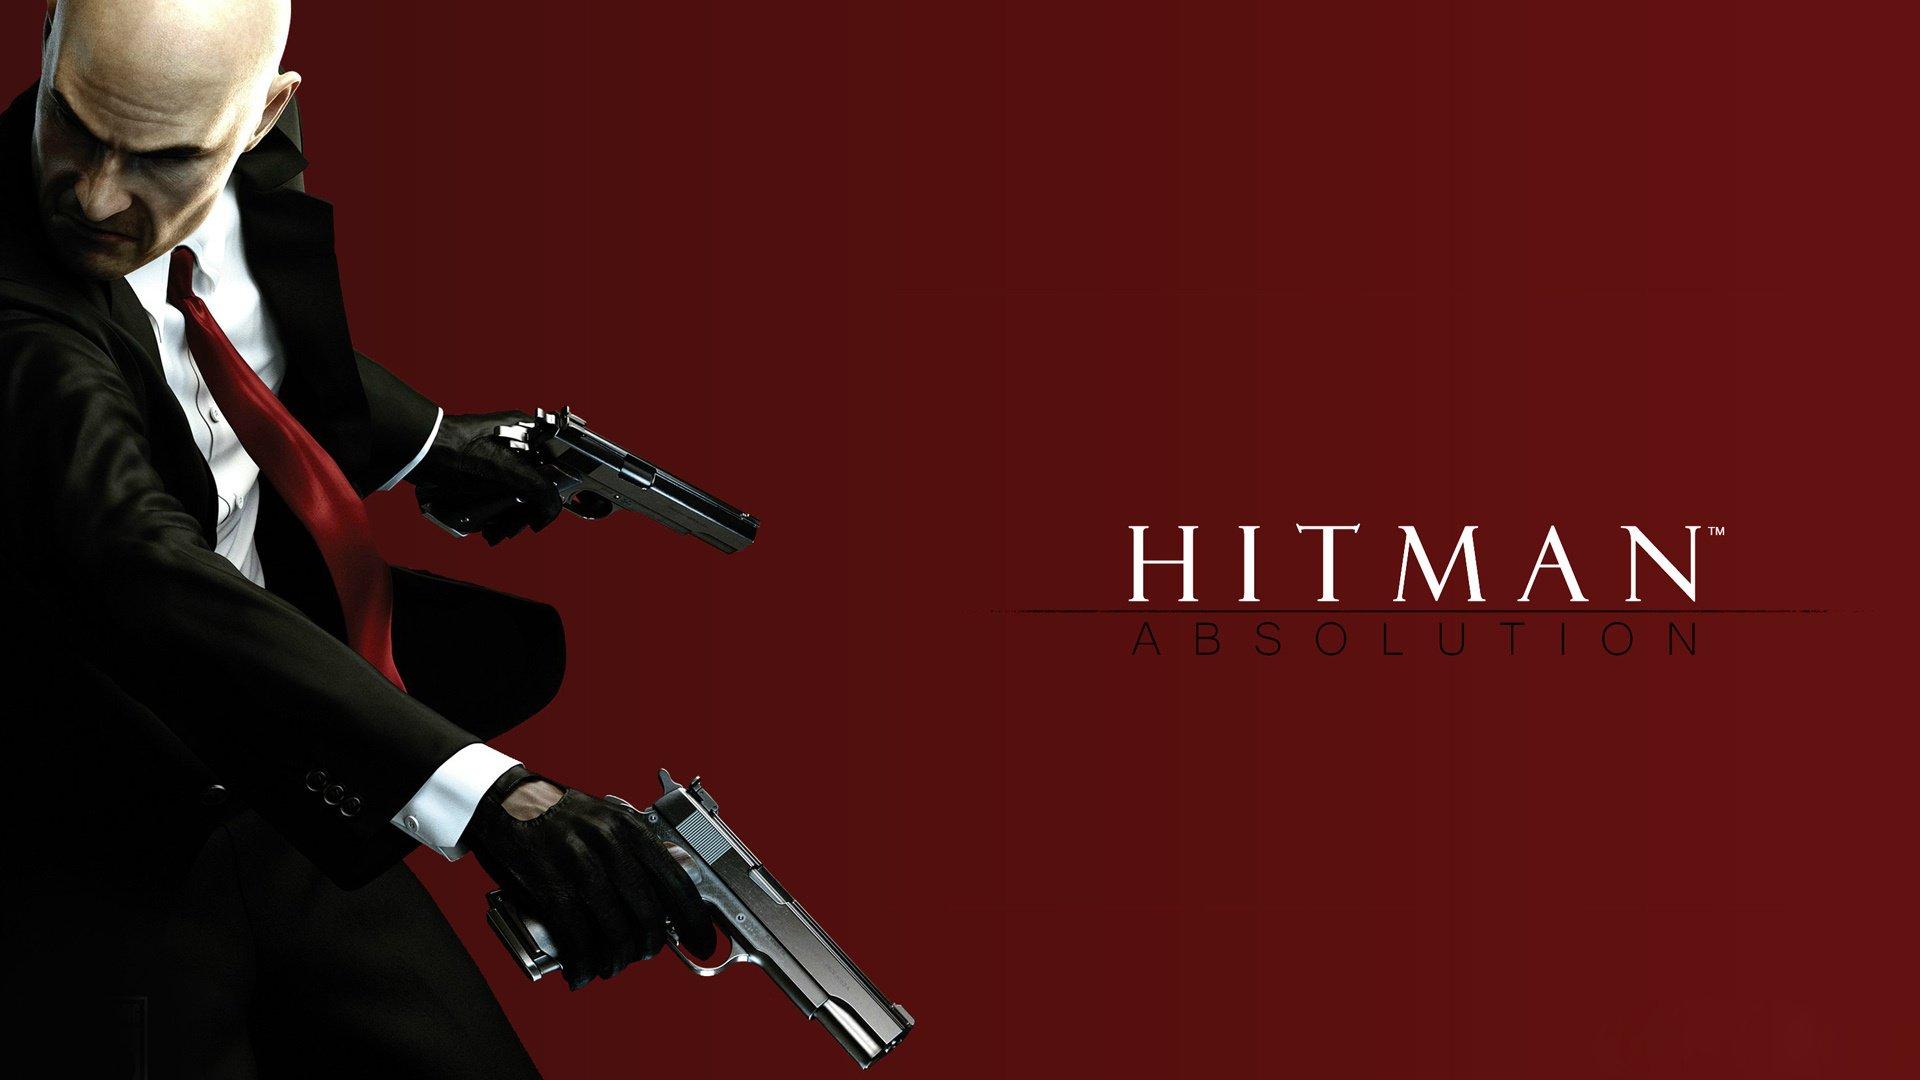 Hitman Absolution Wallpaper Hd Wallpaper Background Image